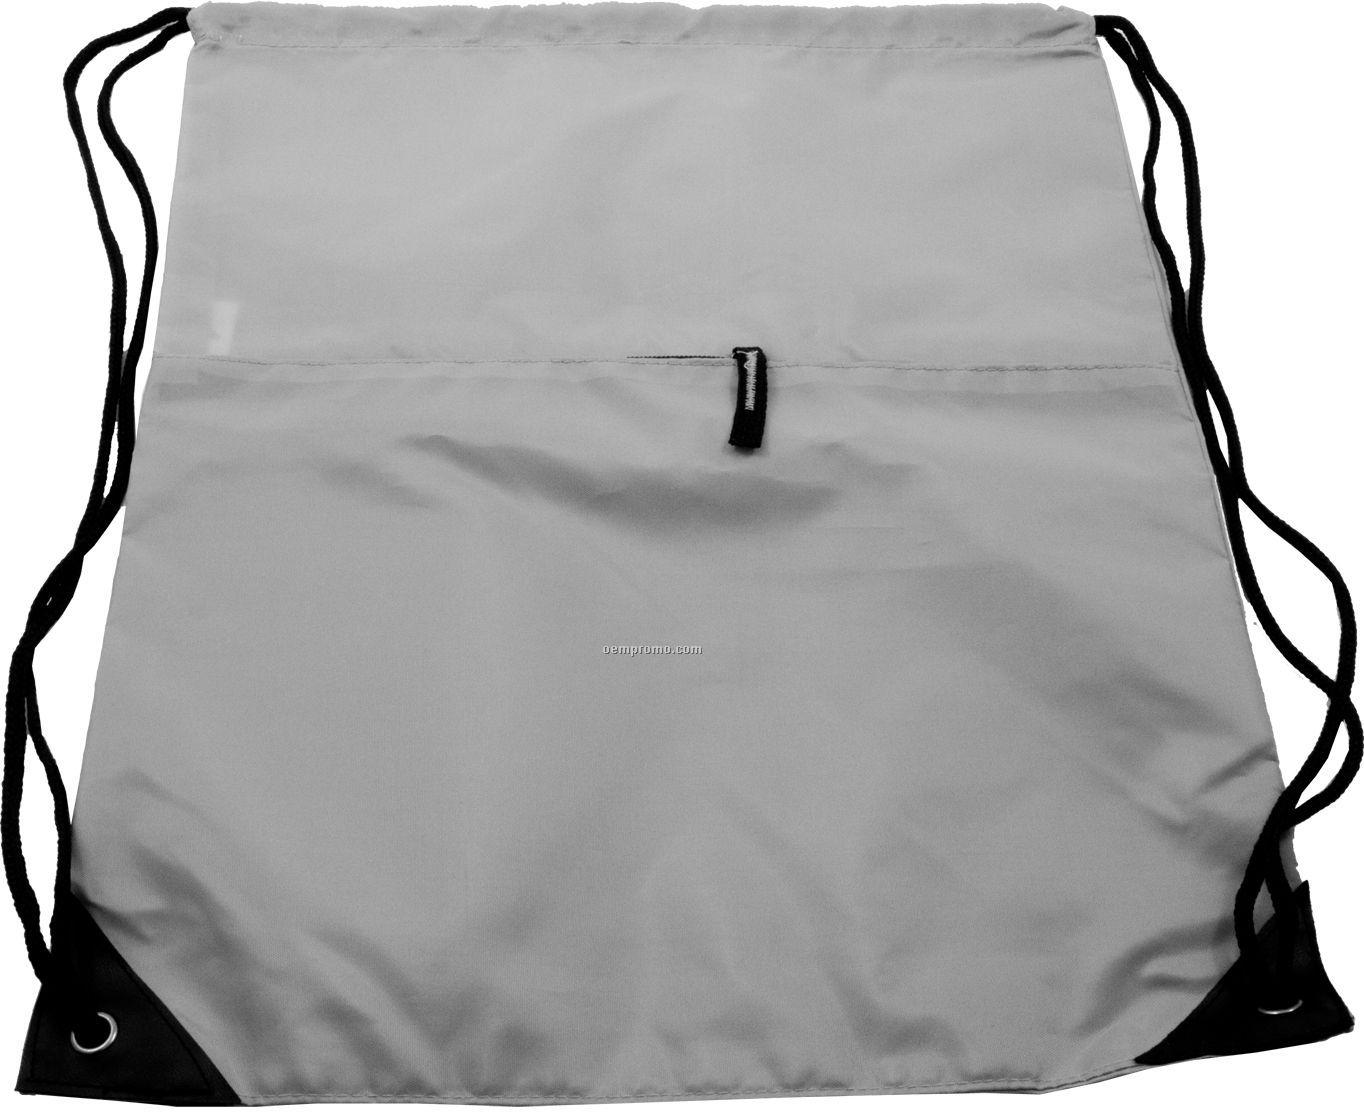 Drawstring Bag W/ Pocket (Overseas 6-7 Week Delivery)